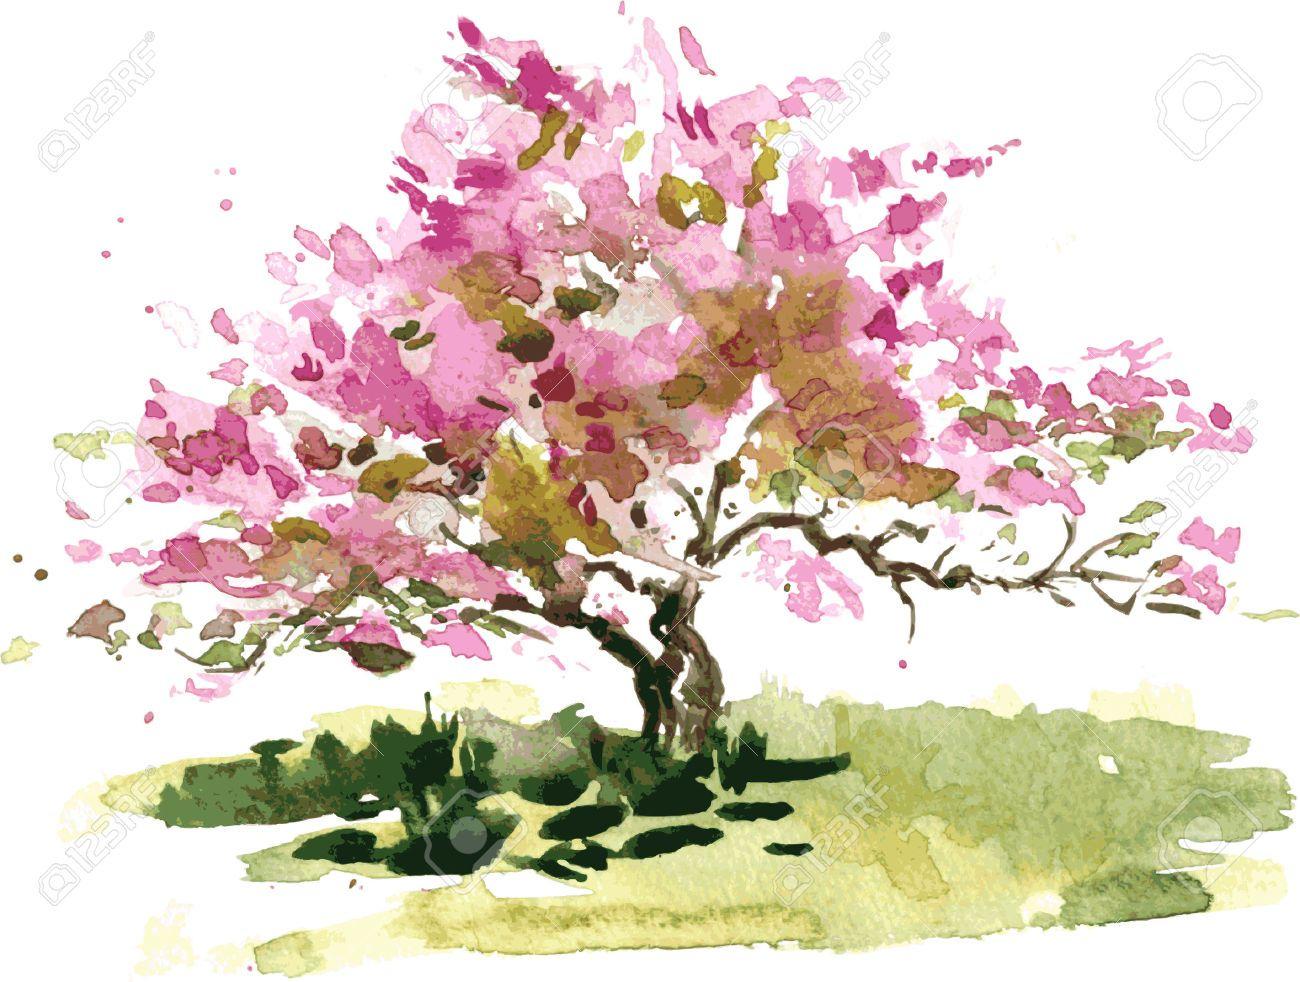 Pin by s e on art fleur de cerisier dessin arbres - Cerisier dessin ...